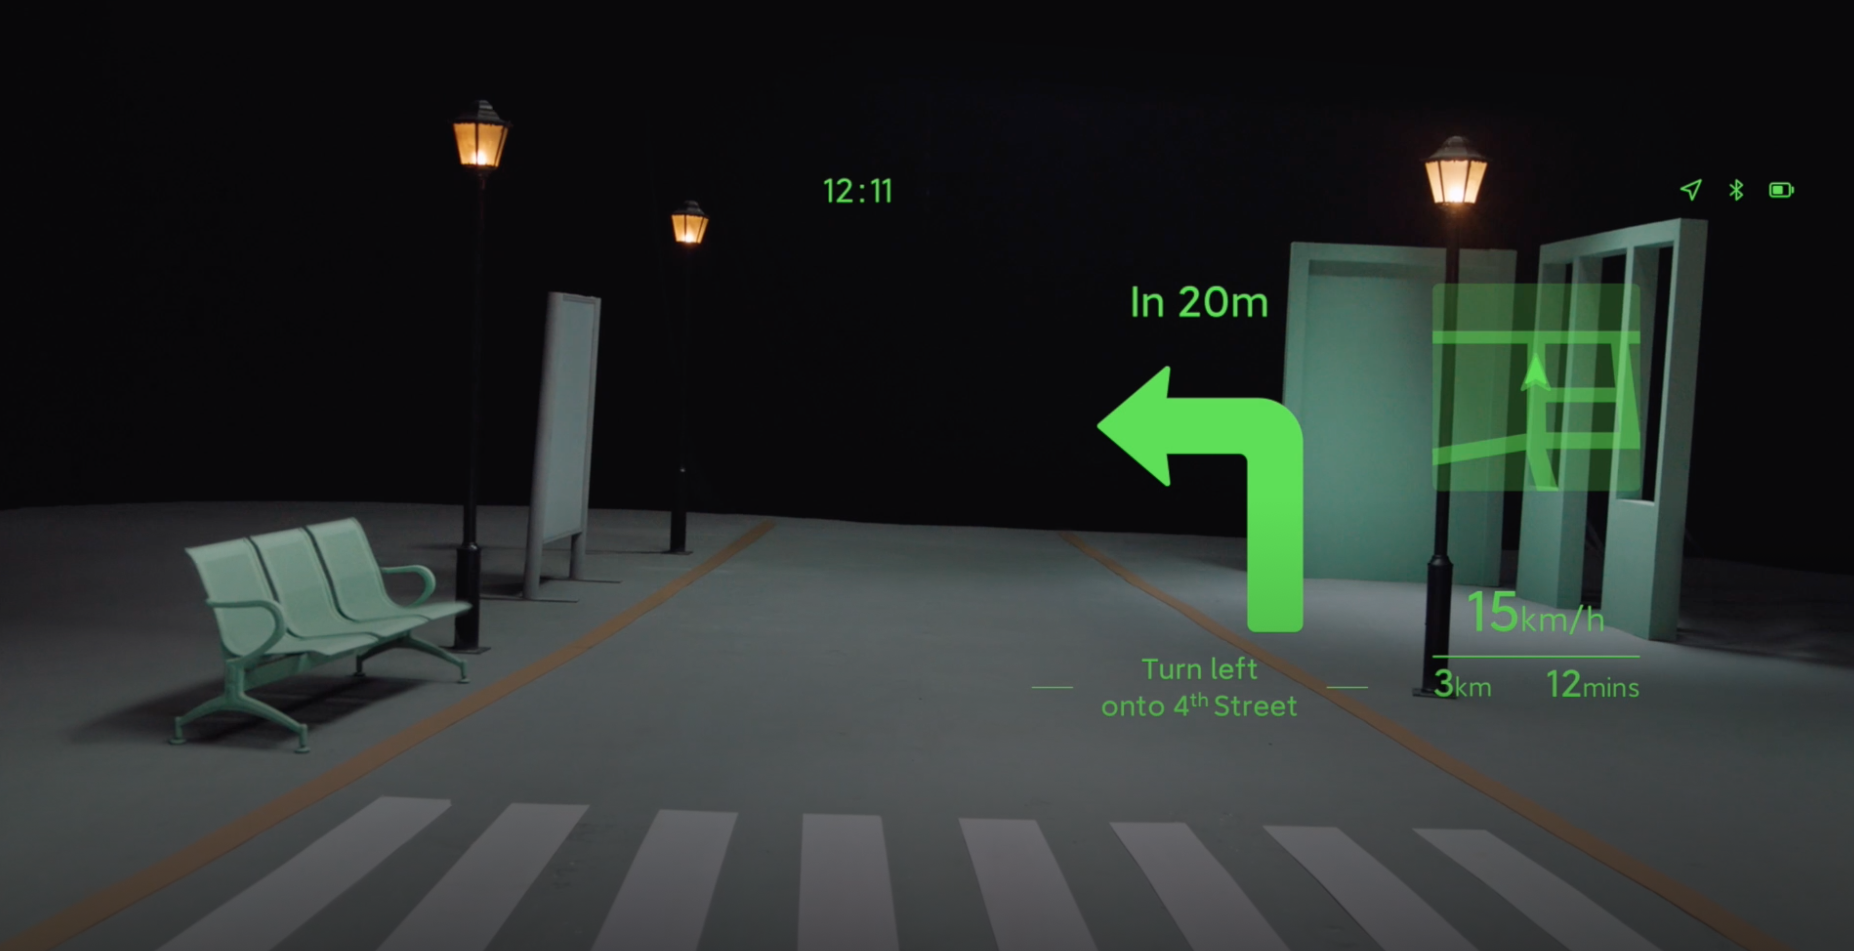 xiaomi-smart-glasses-navigation